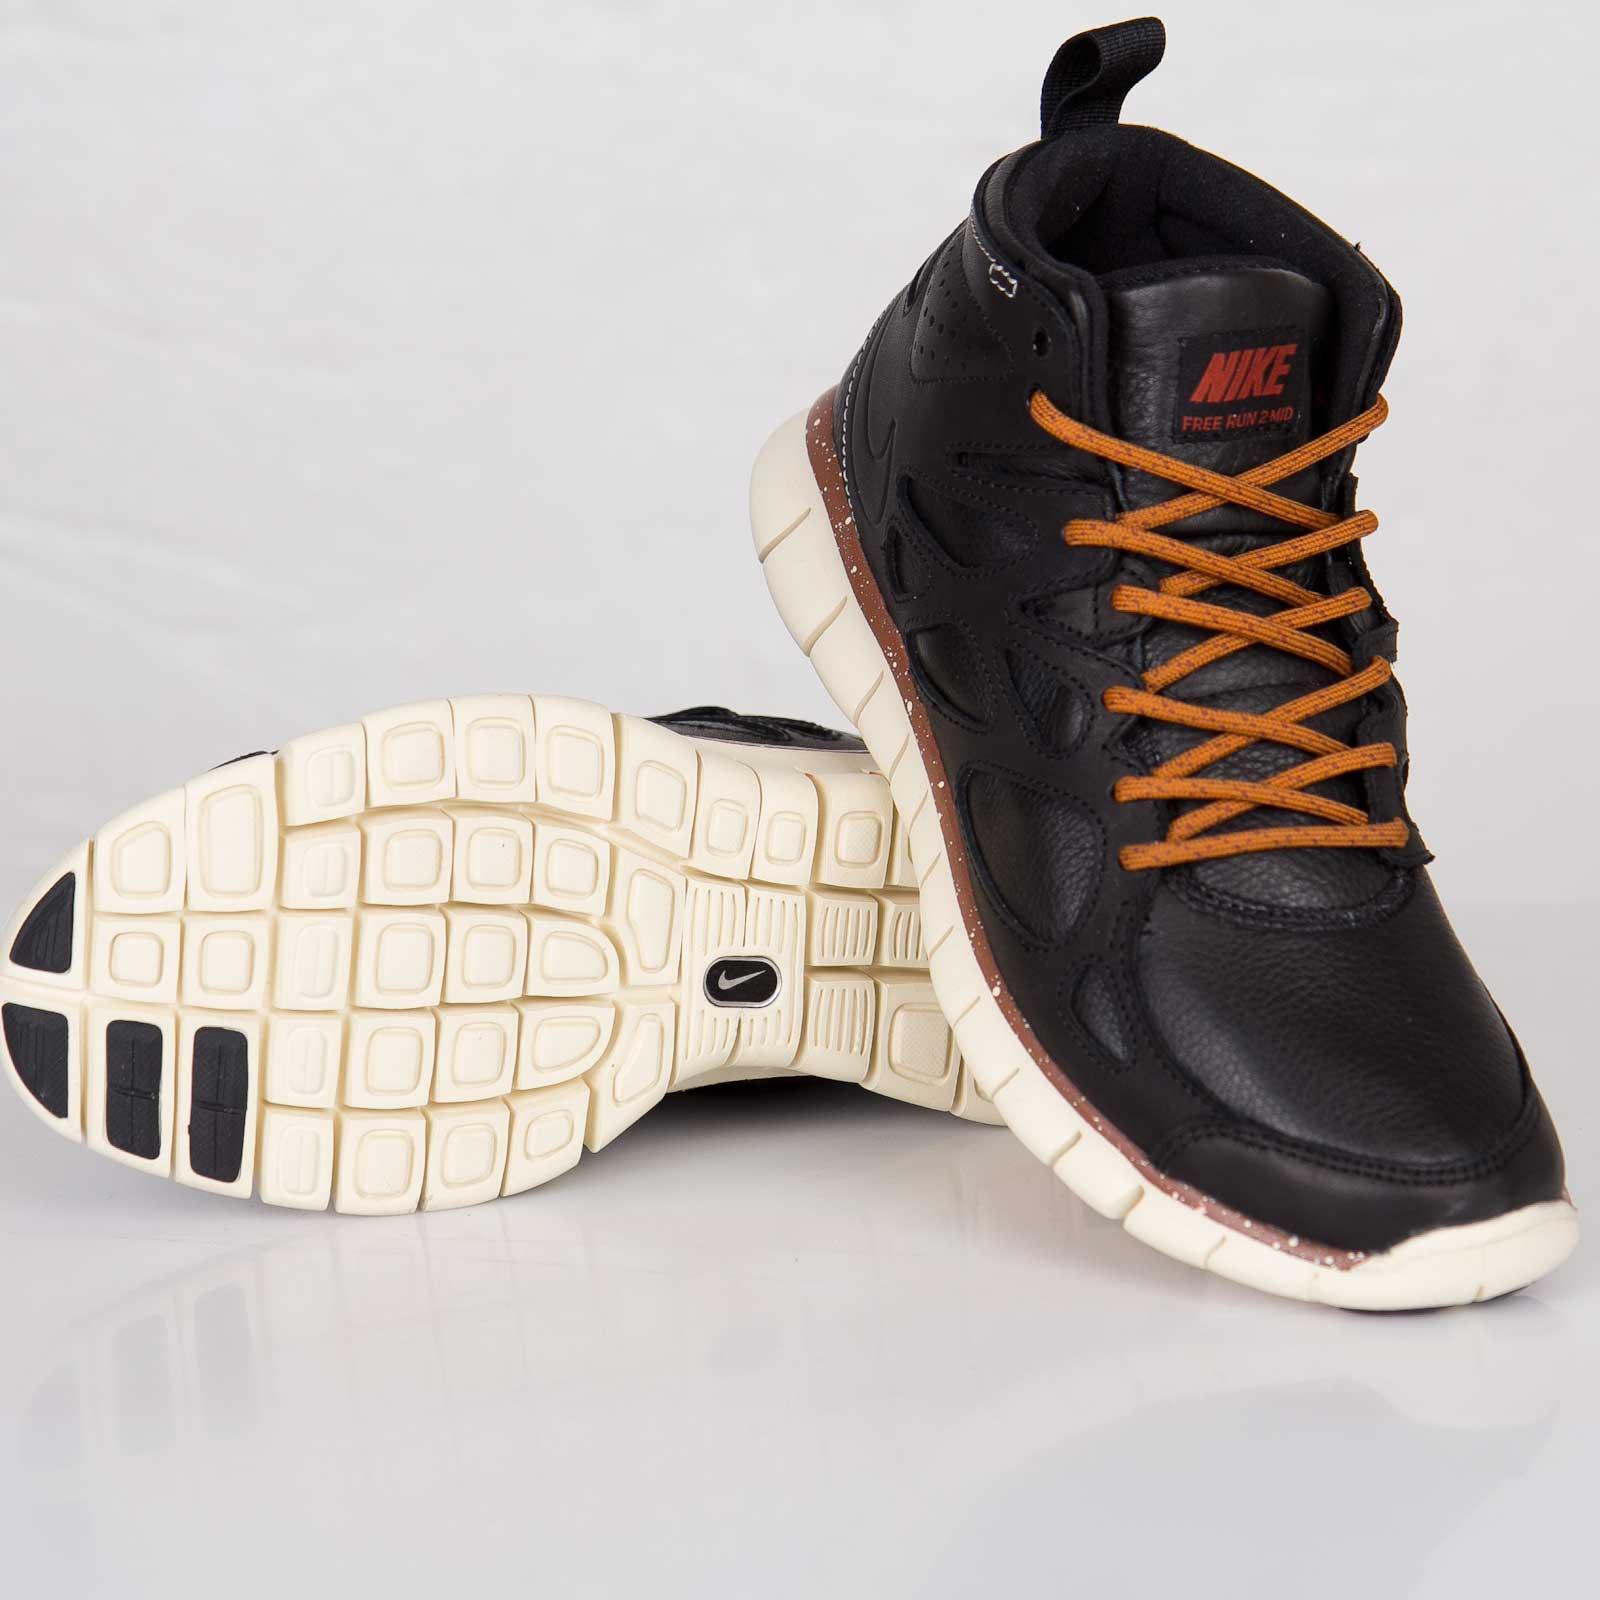 Nike Free Run 2 Sneakerboot QS - 637996